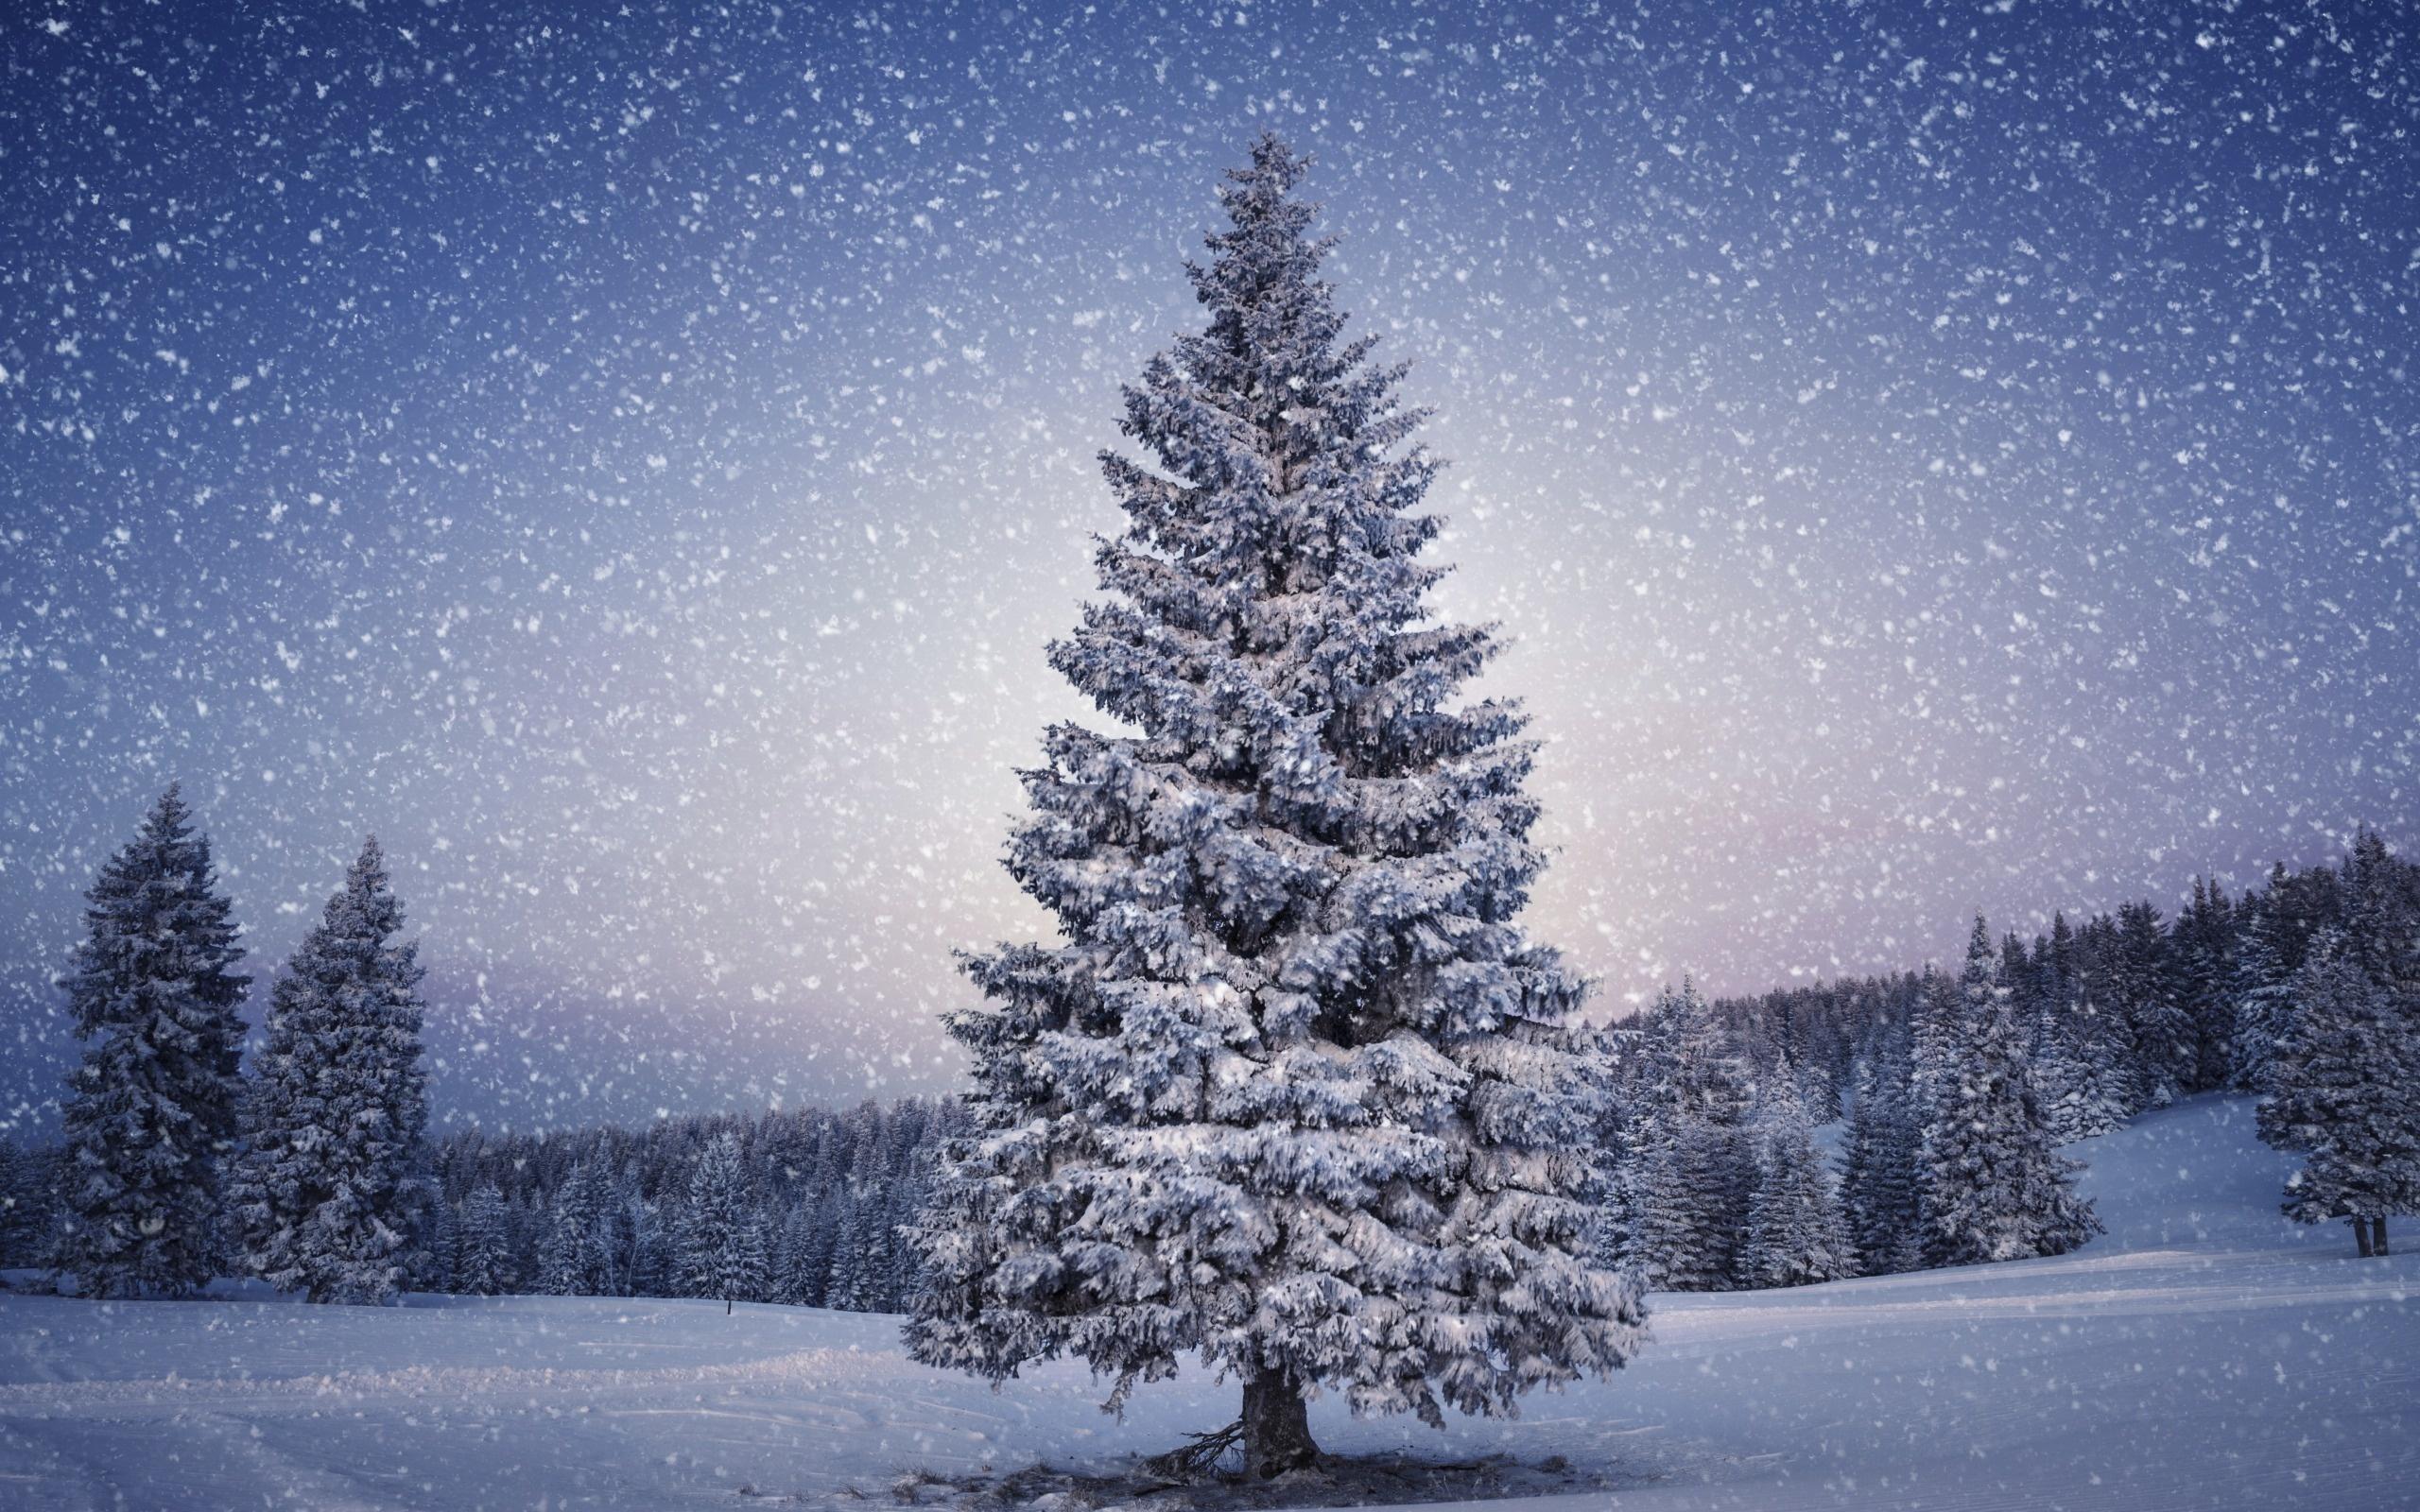 snowy christmas backgrounds wallpapersafari